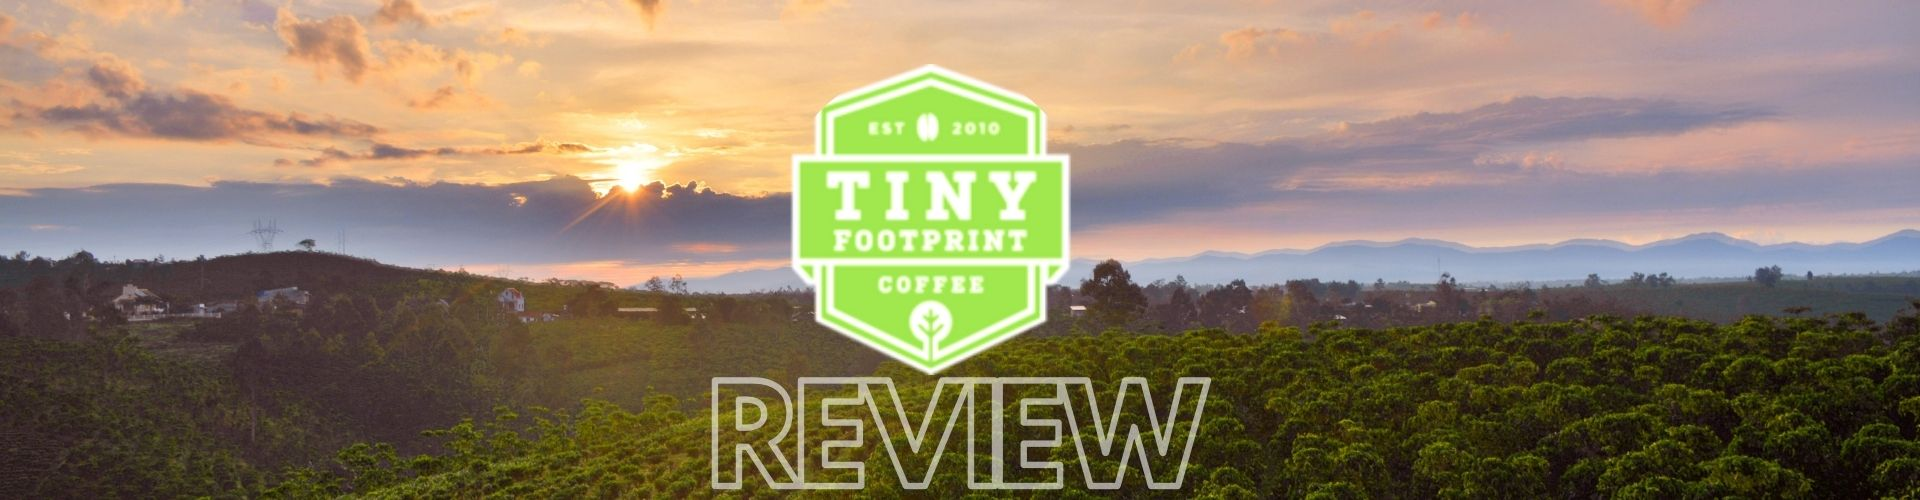 tiny footprint coffee image